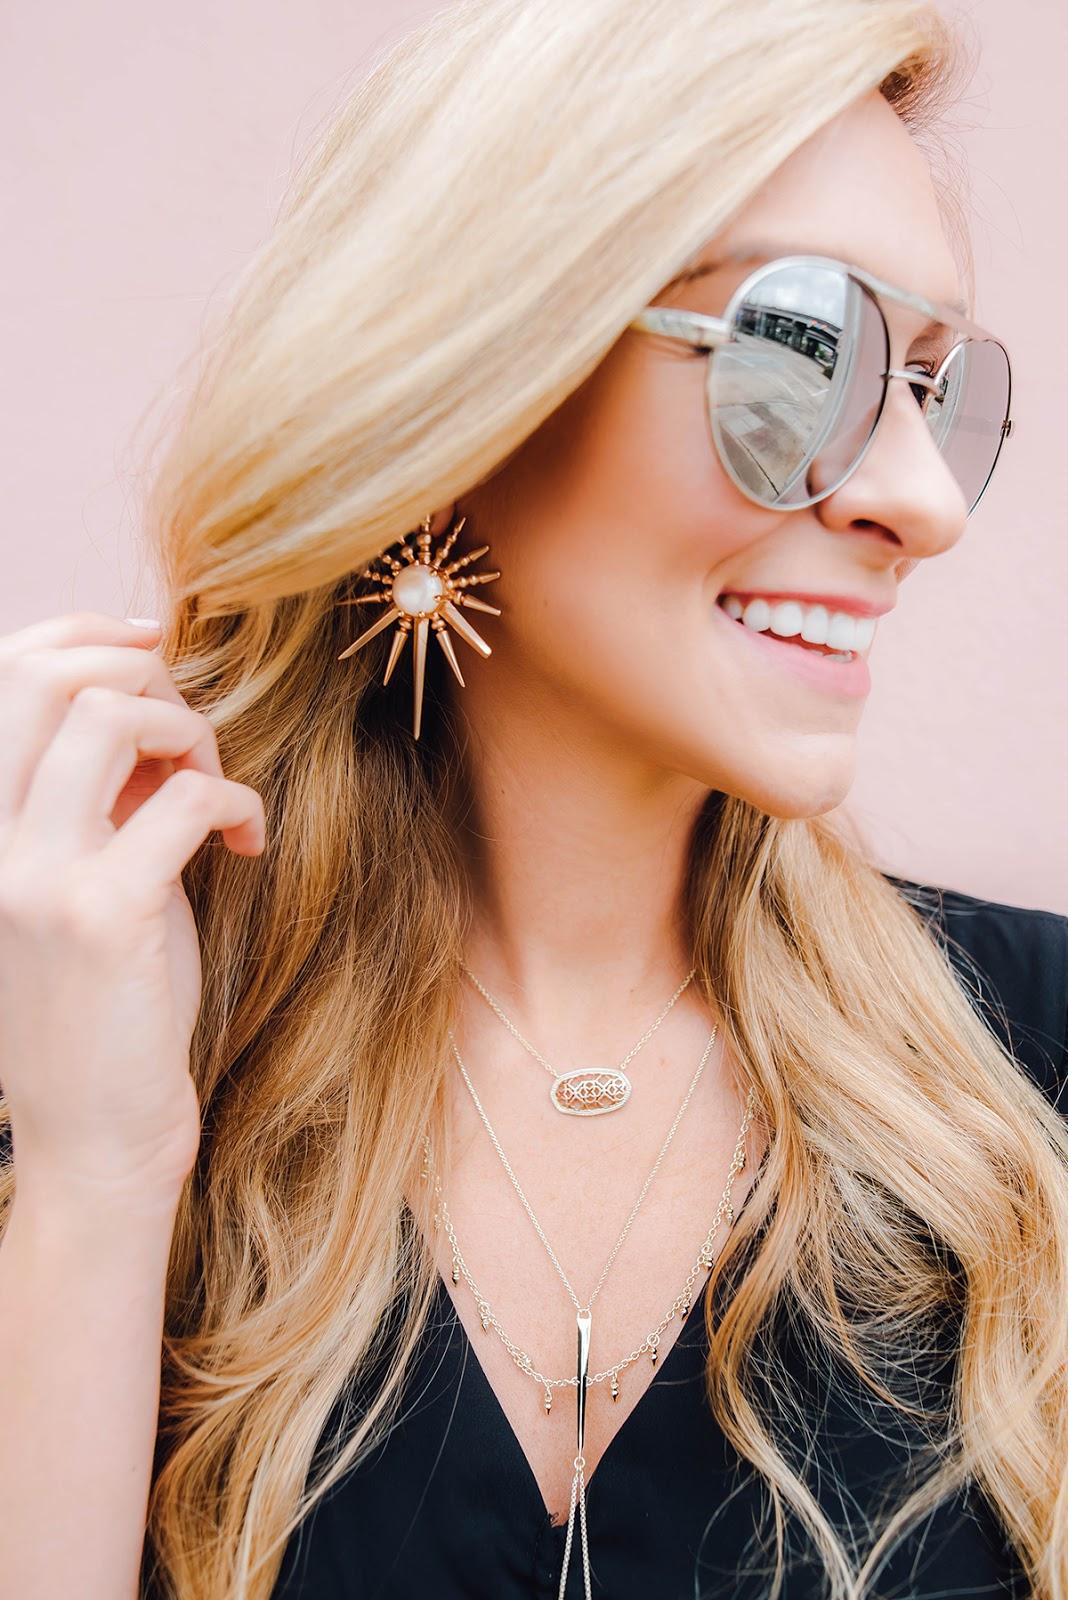 Kendra Scott Dollie necklace / apinchoflovely.com